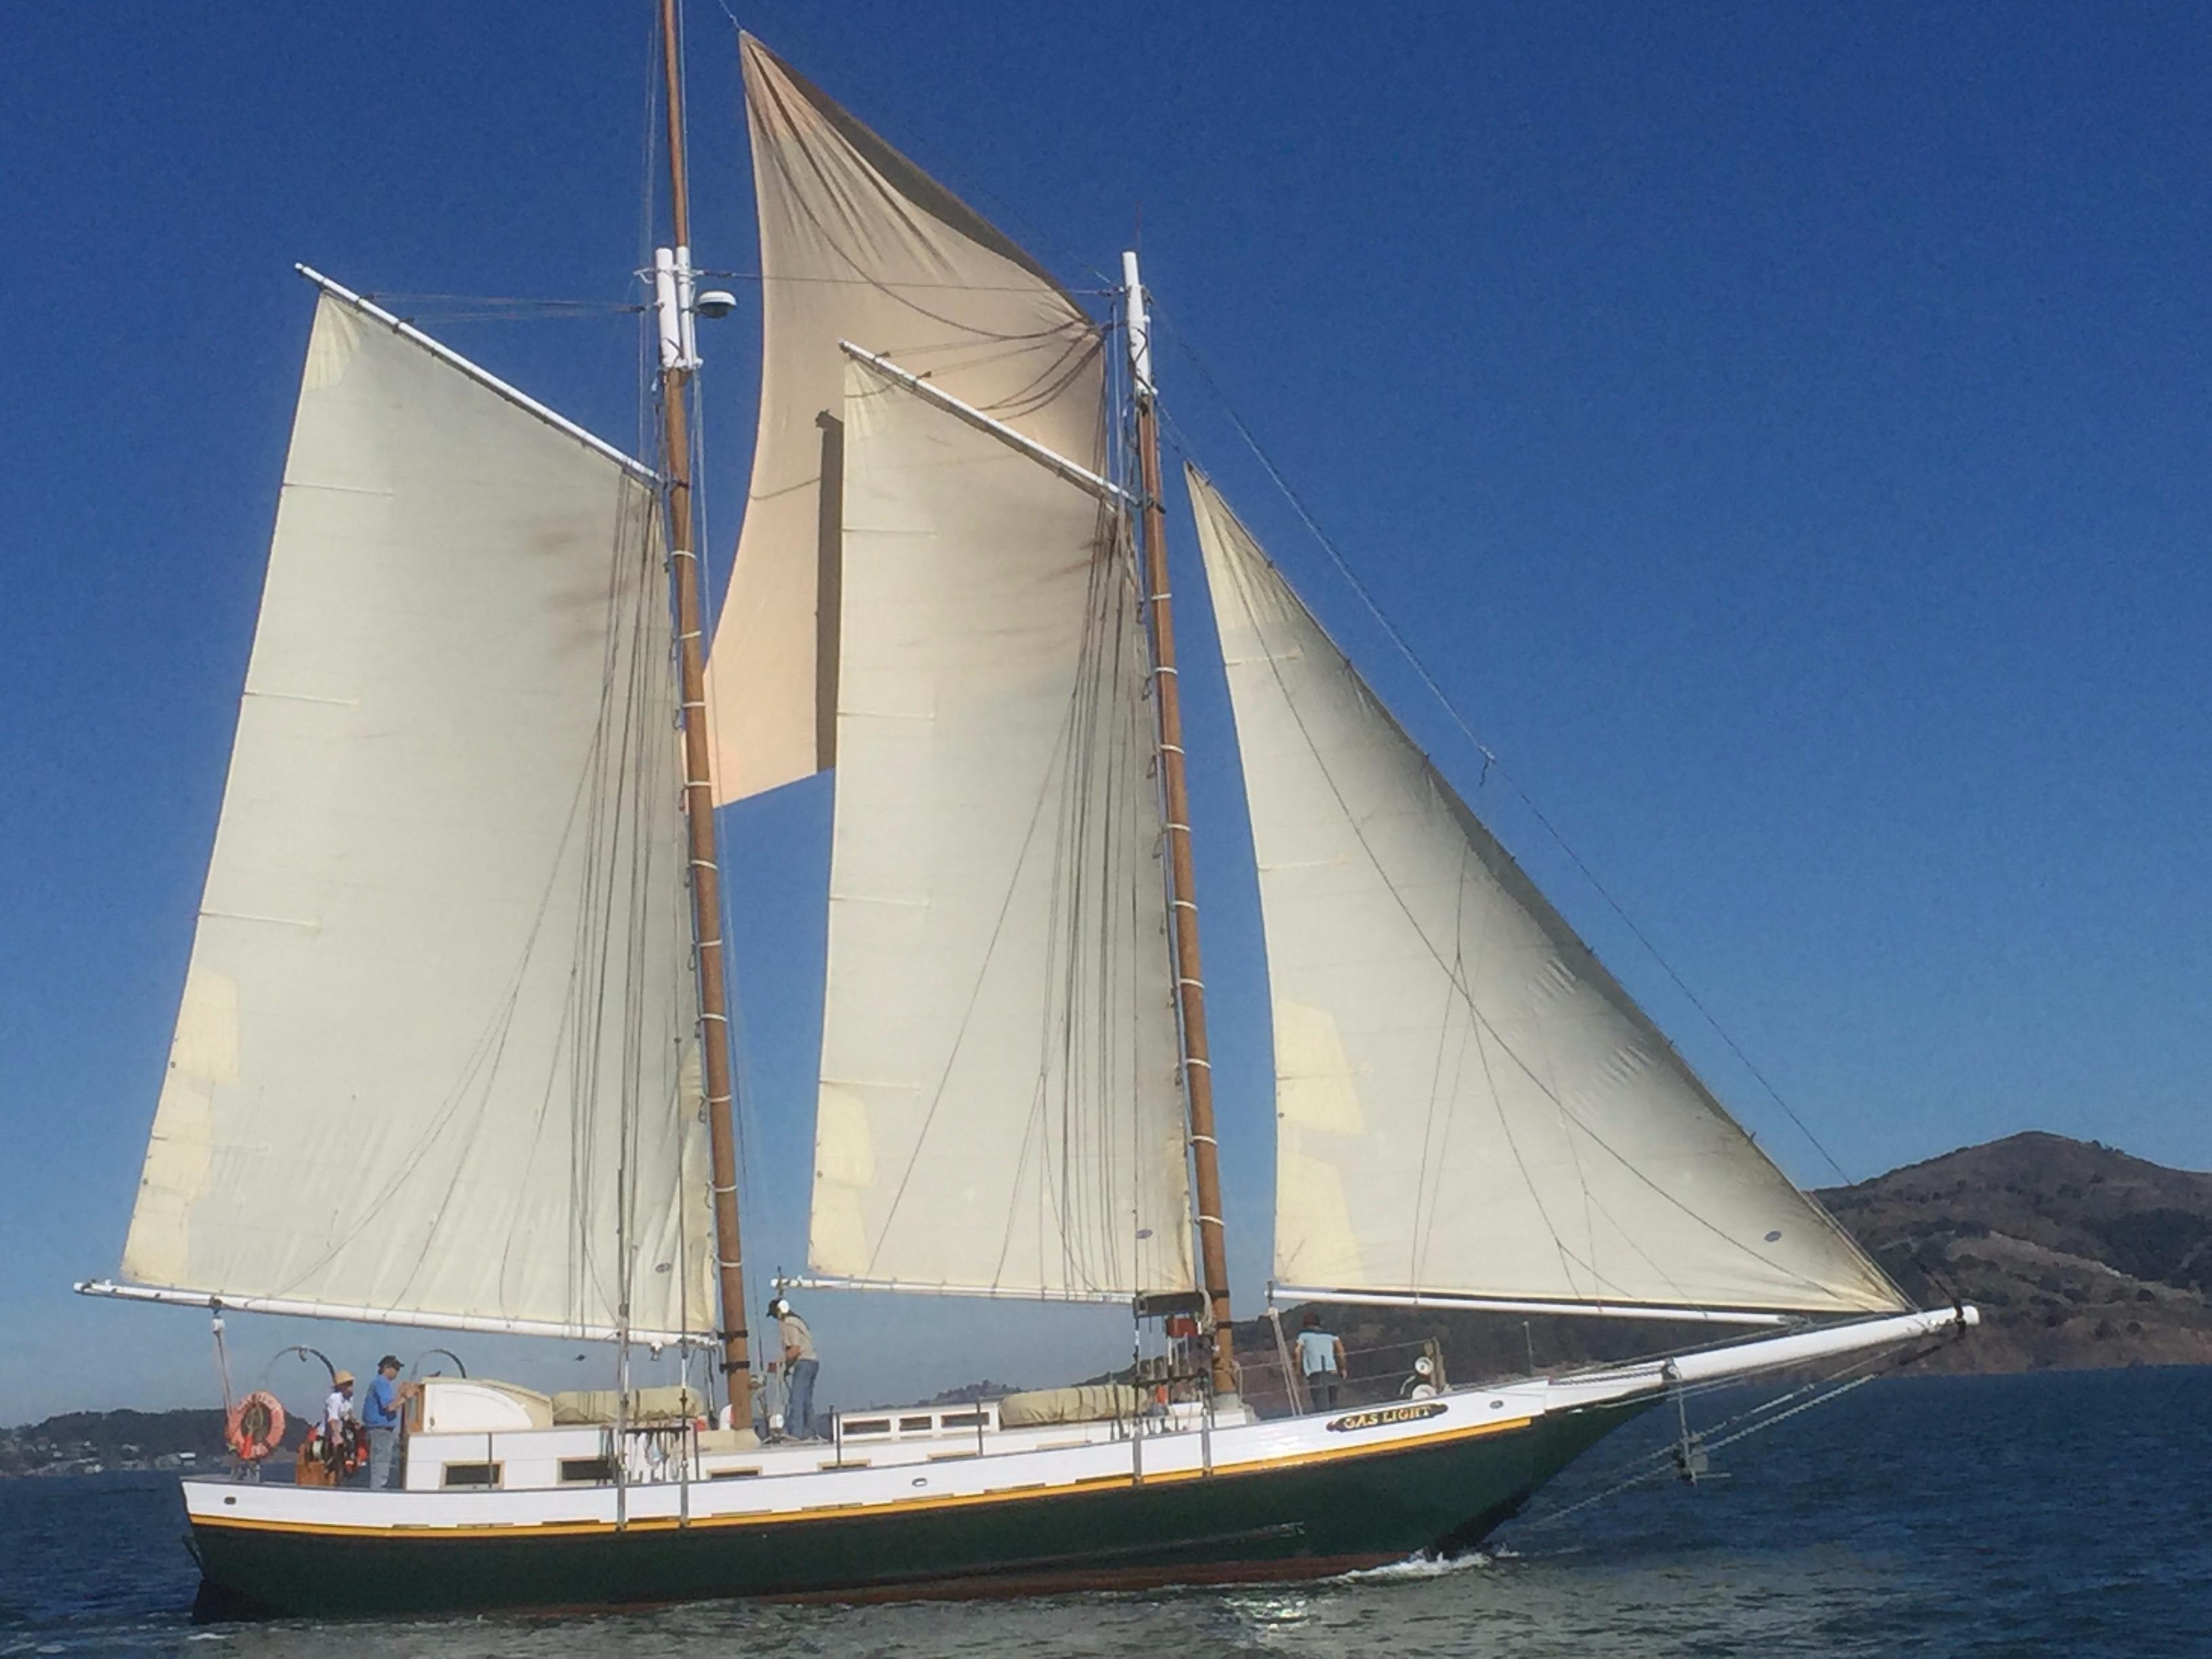 72\' Custom Scow Schooner Yacht For Sale - Rubicon Yachts